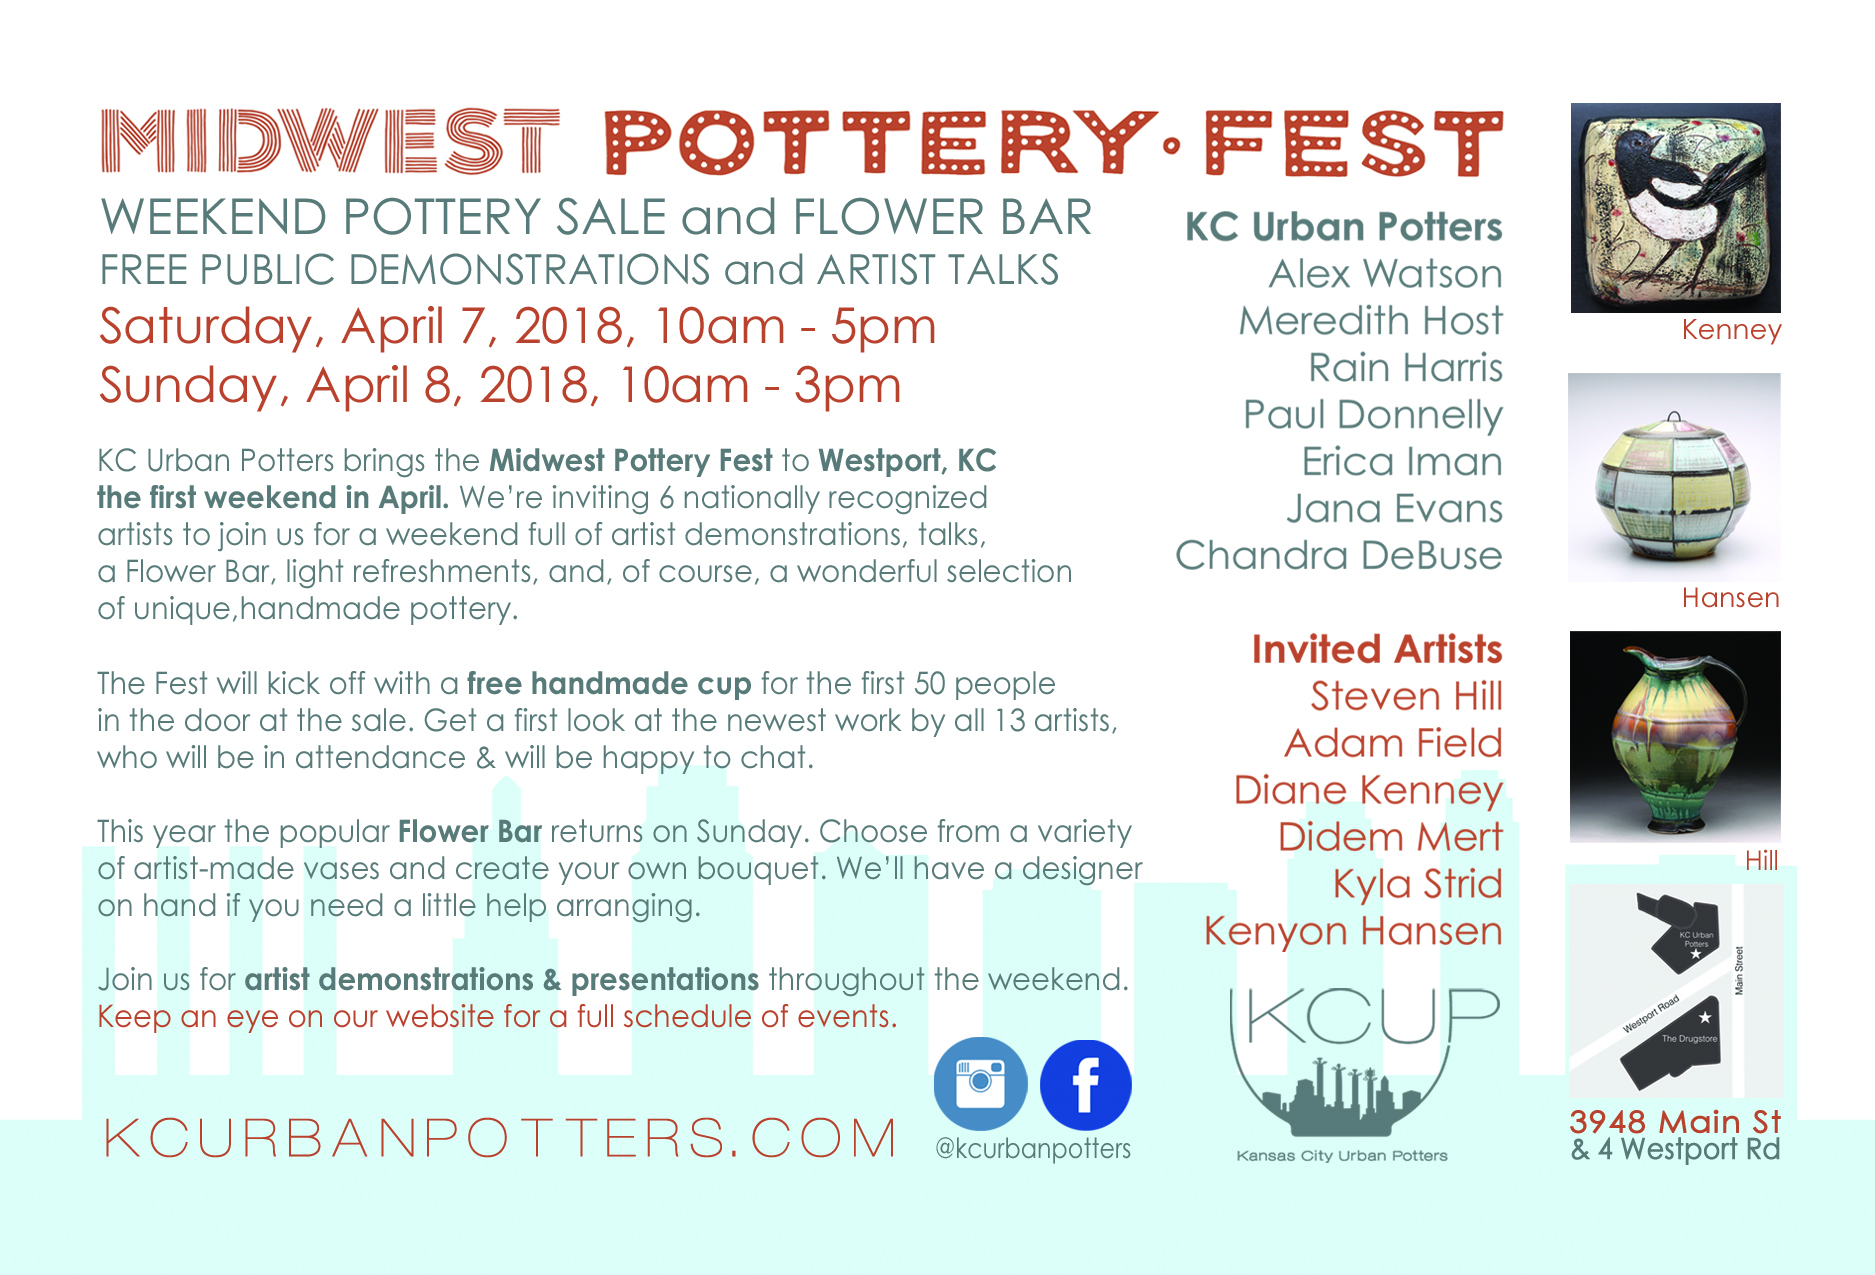 midwest pottery fest kansas city